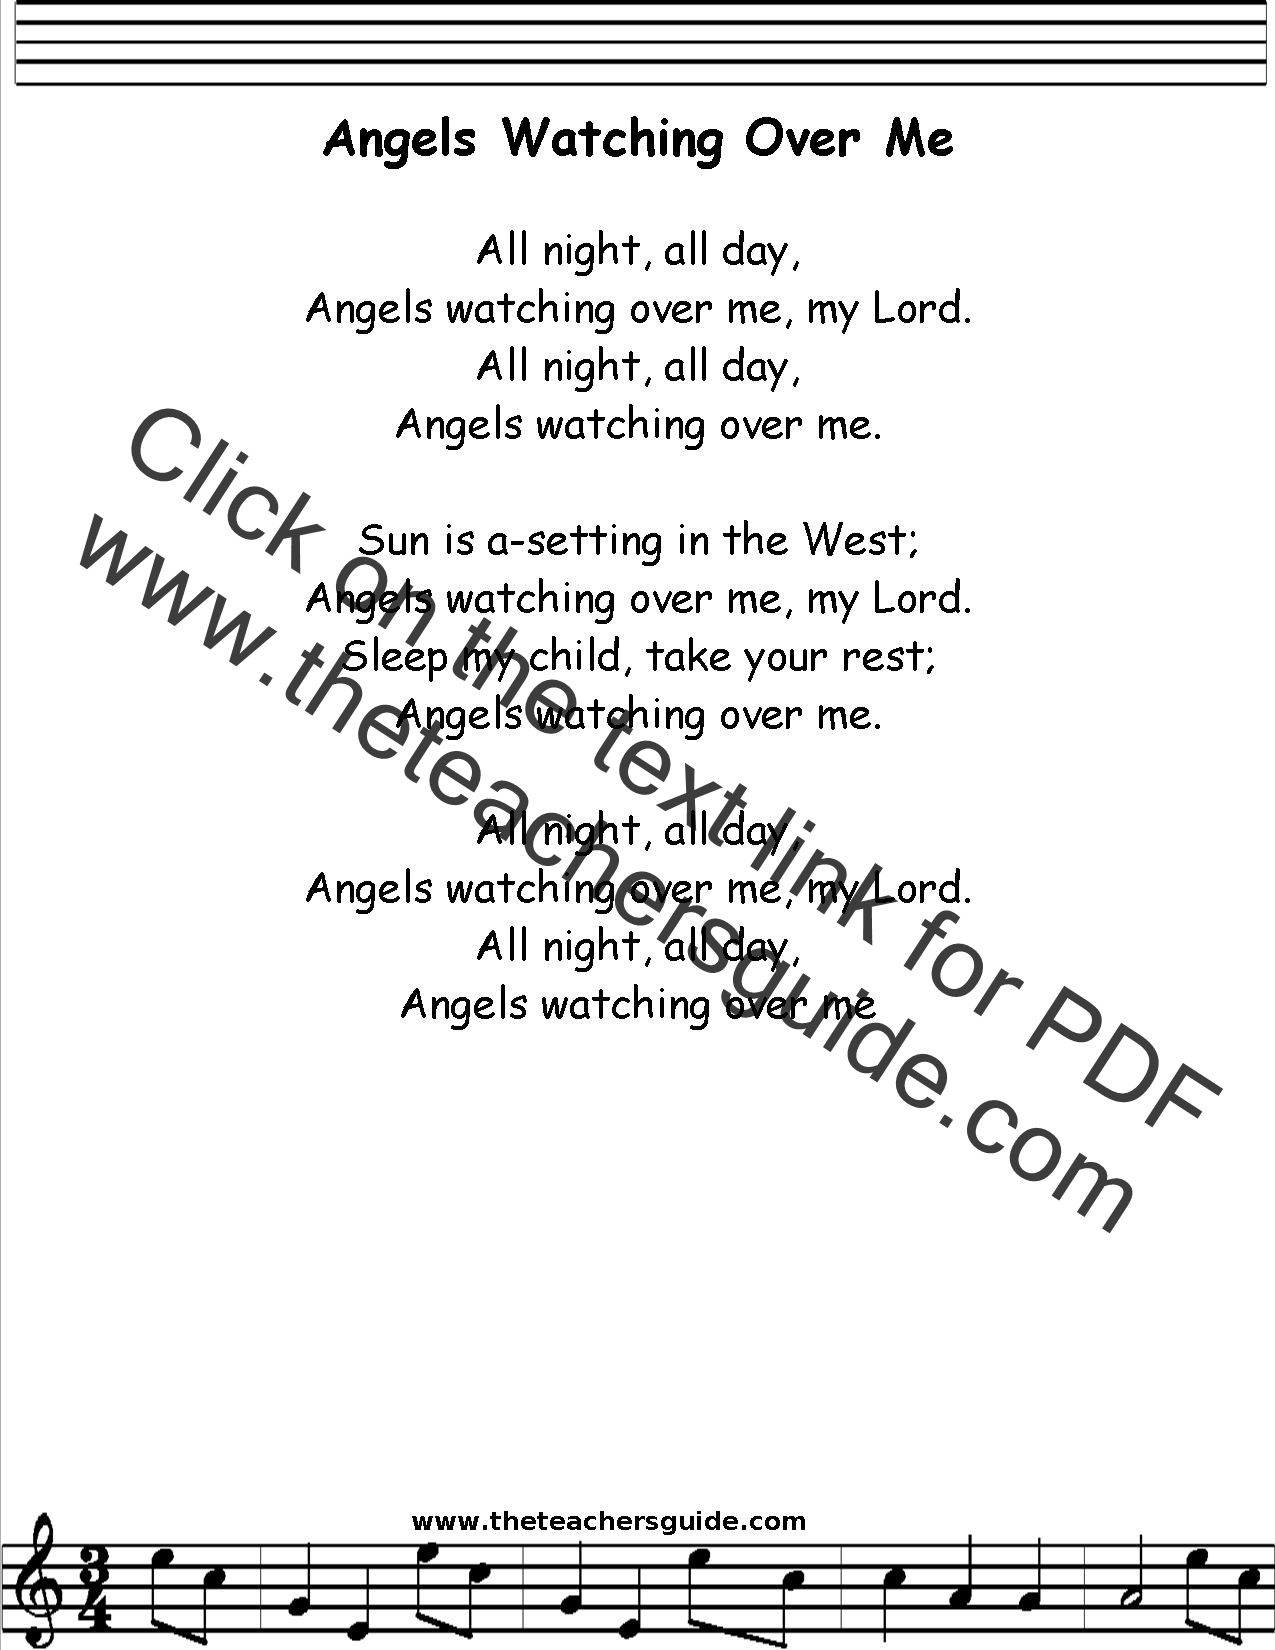 Angels Watching Over Me Lyrics Printout Midi And Video